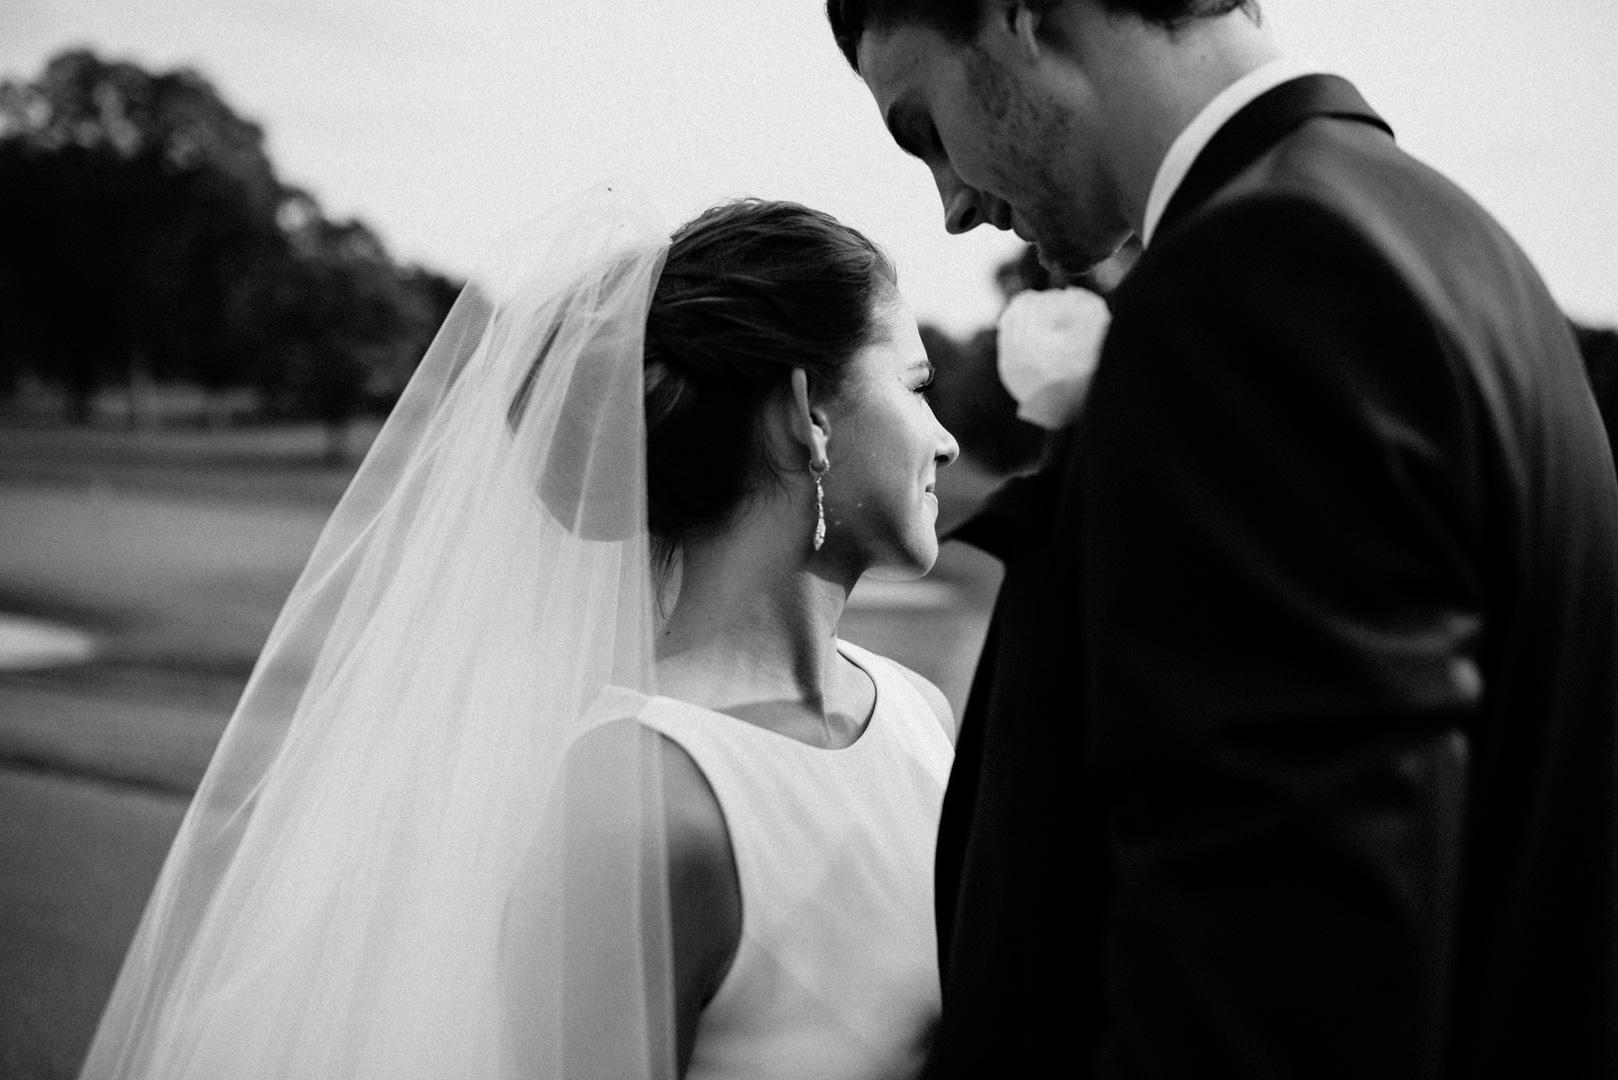 sean-delexi-wedding-774.jpg